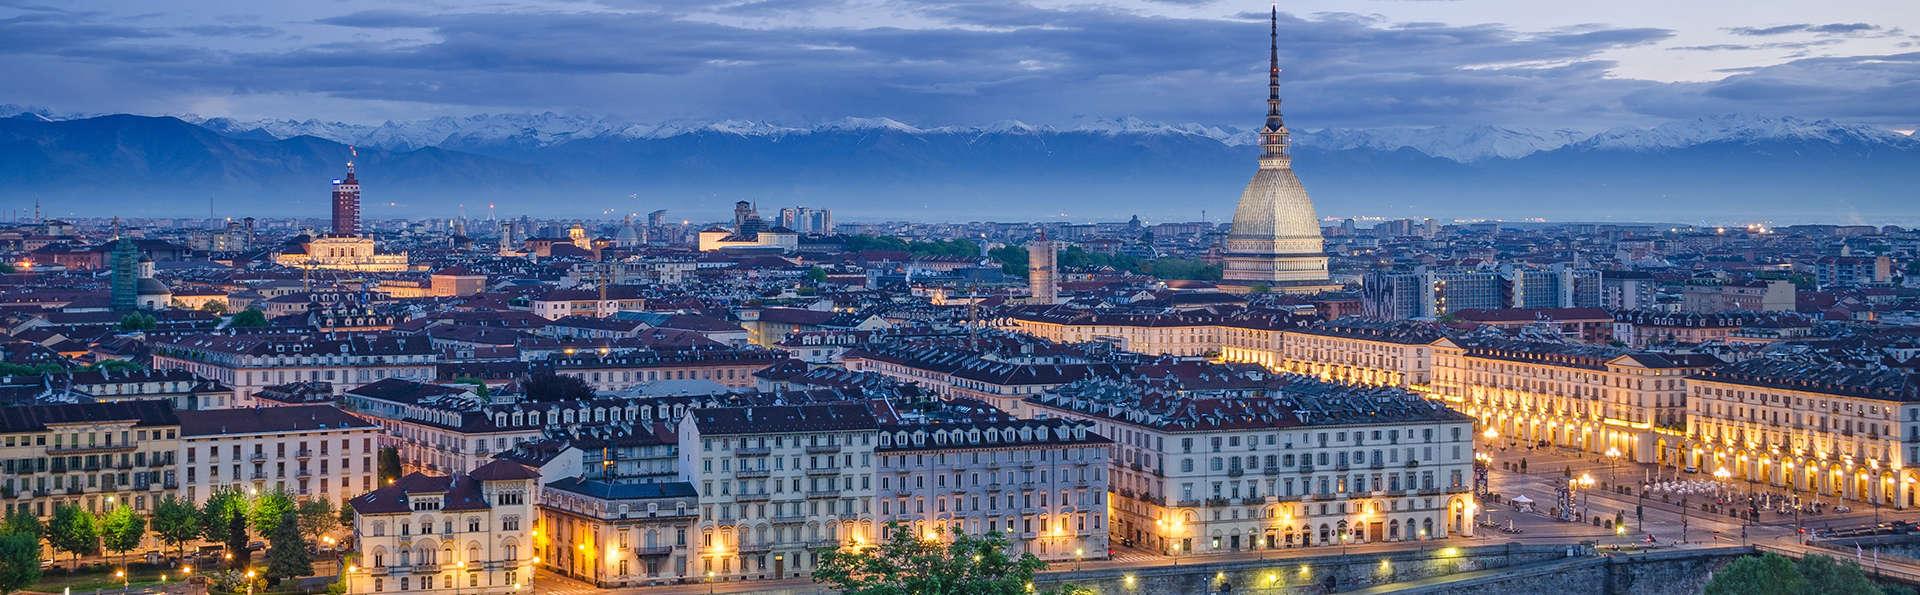 QUALYS-HOTEL Royal Torino - EDIT_turin3.jpg